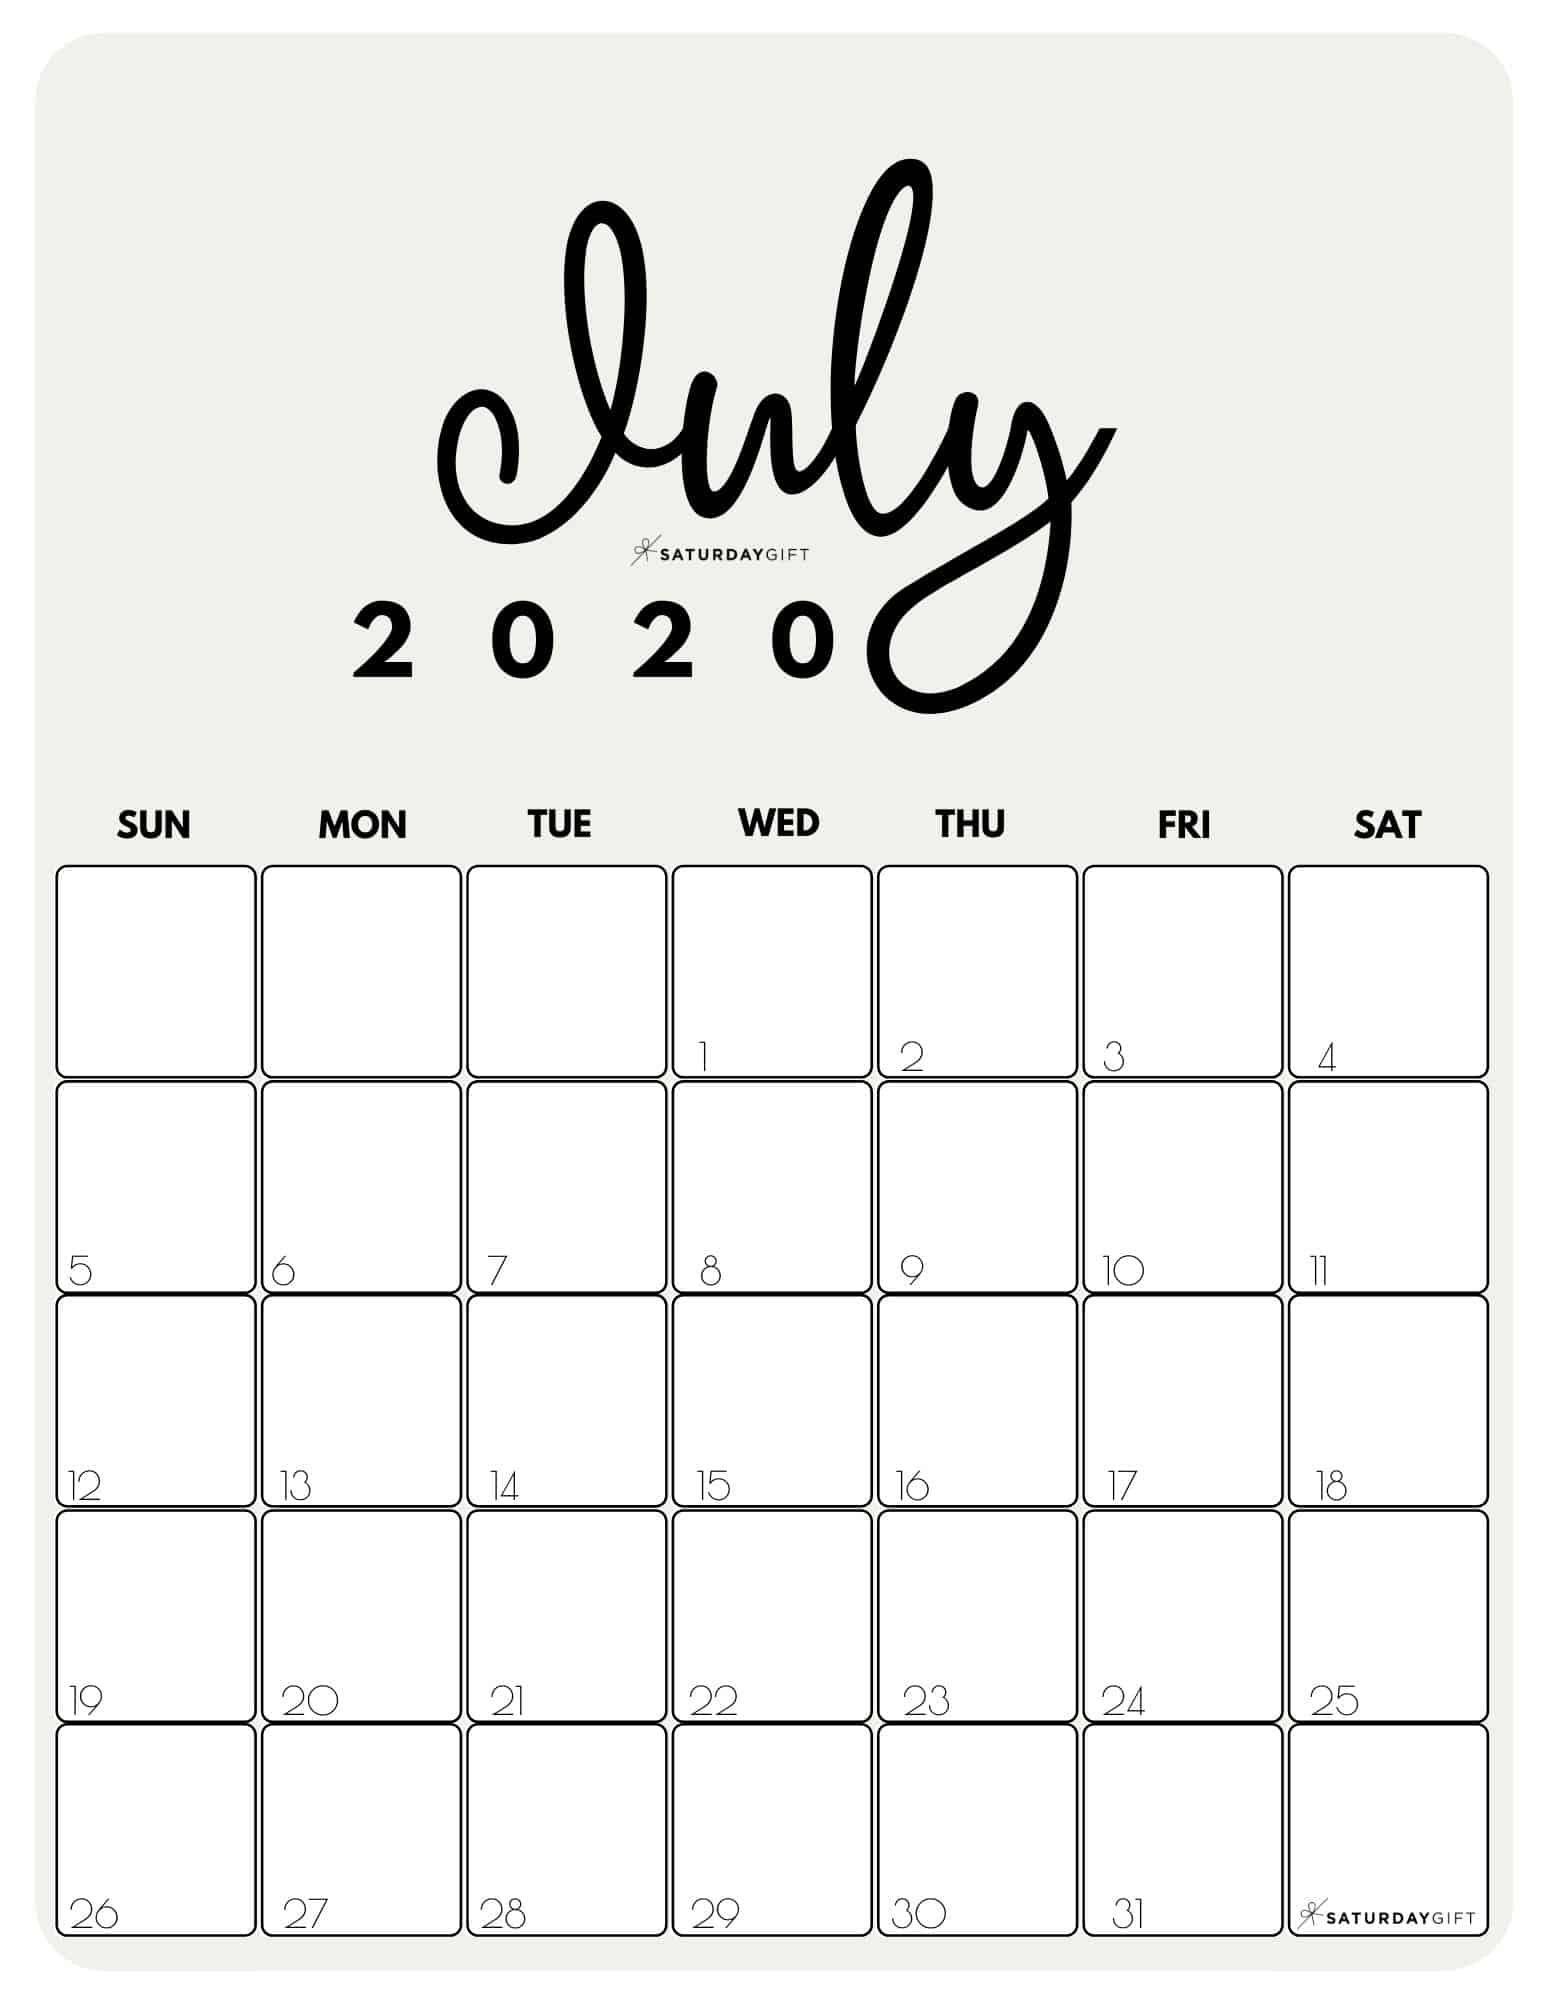 Catch Cute Free Printable Calenxdar July